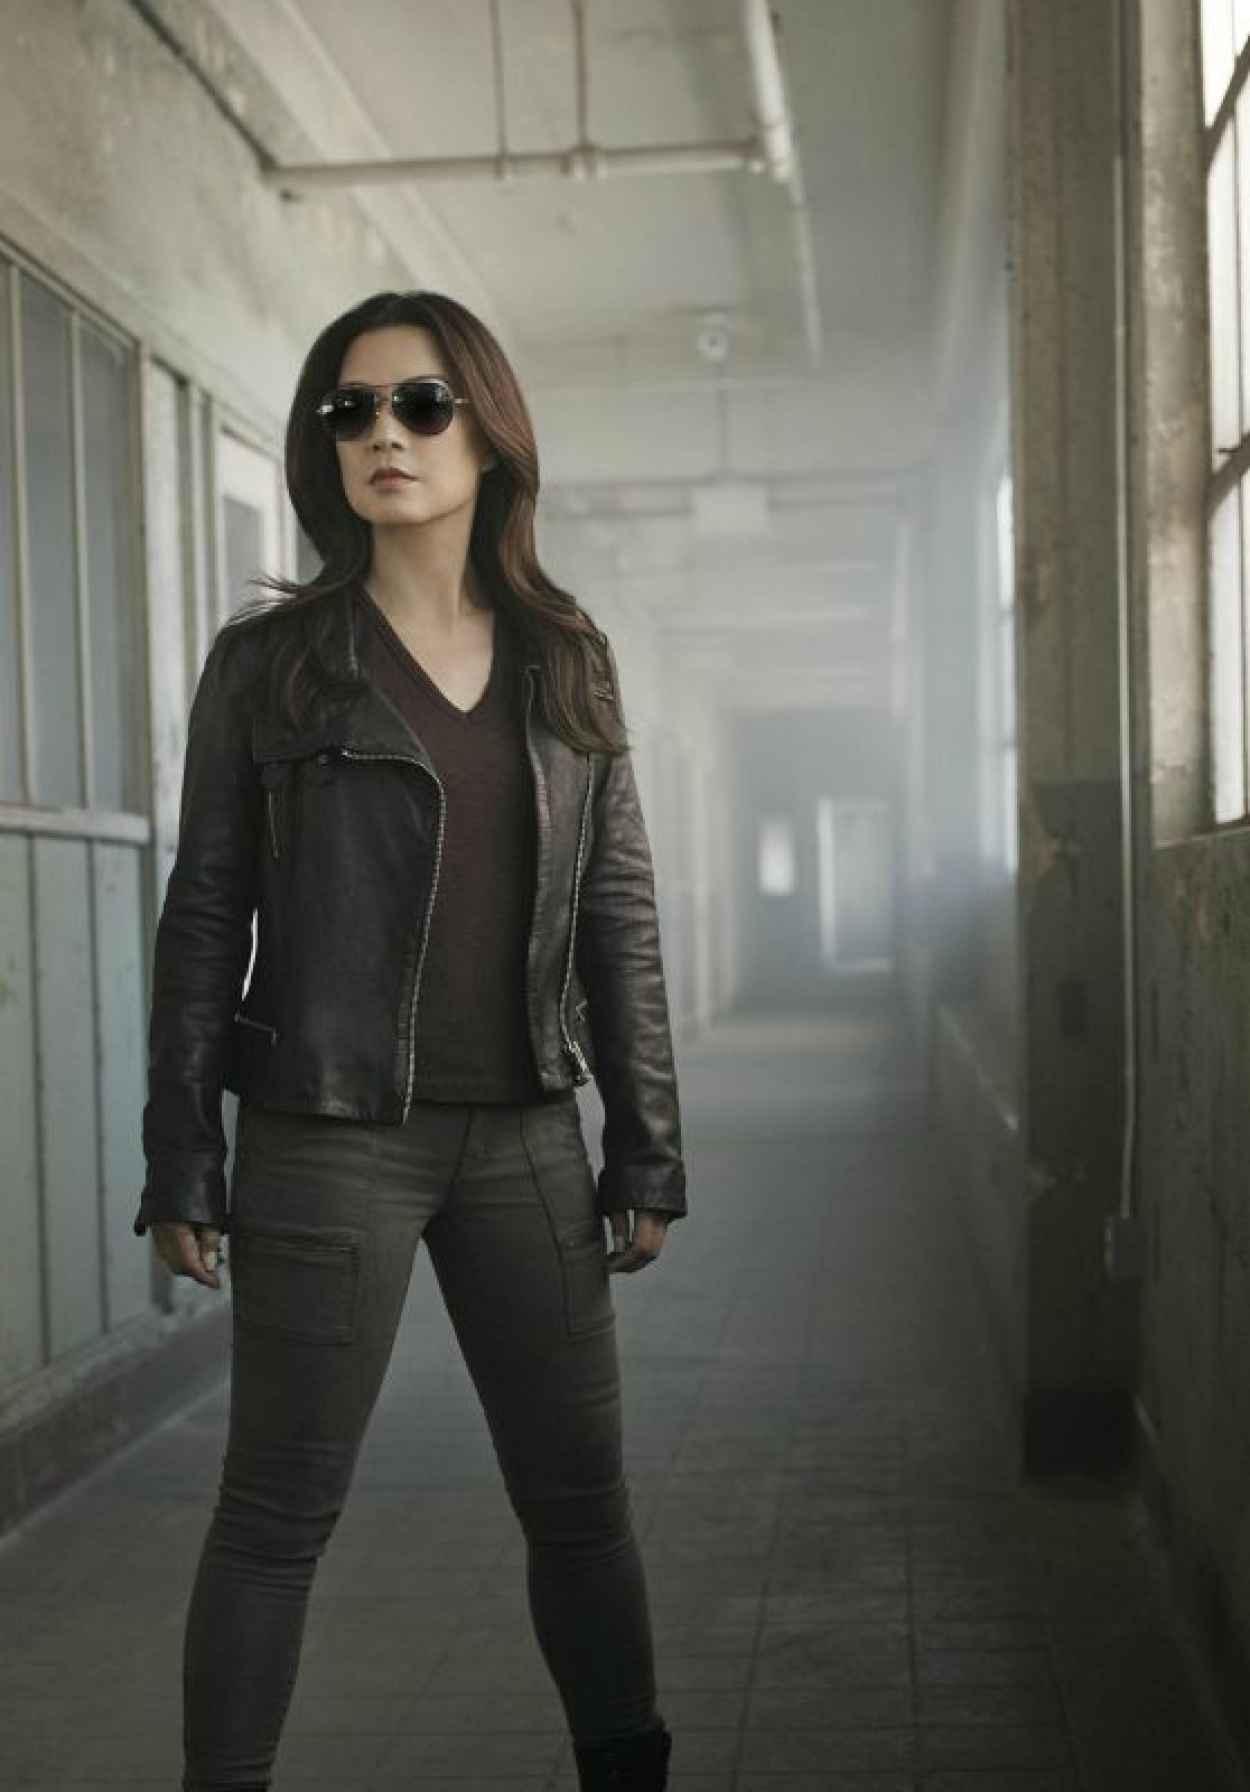 Ming-Na Wen - Agents of SHIELD Season 3 Promos & Stills-1